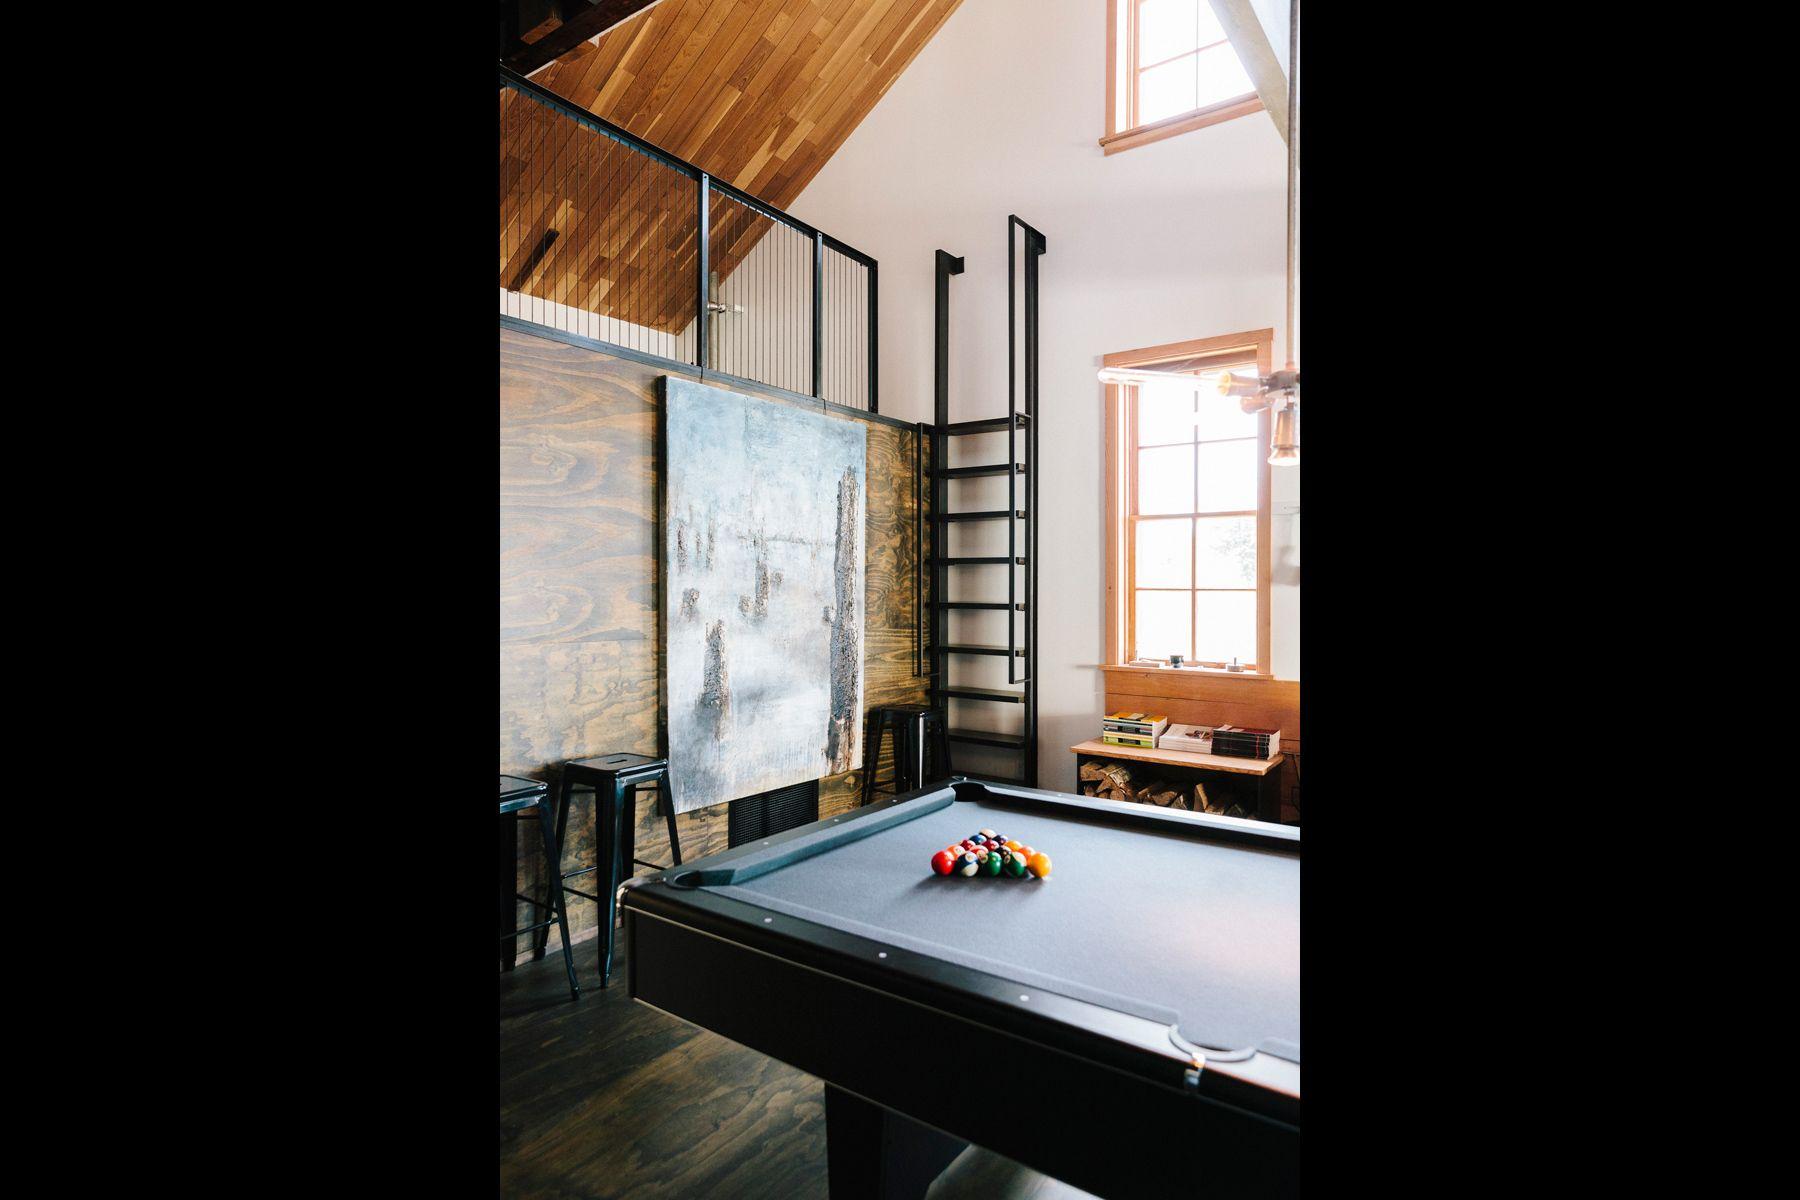 Boathouse Billiards Room